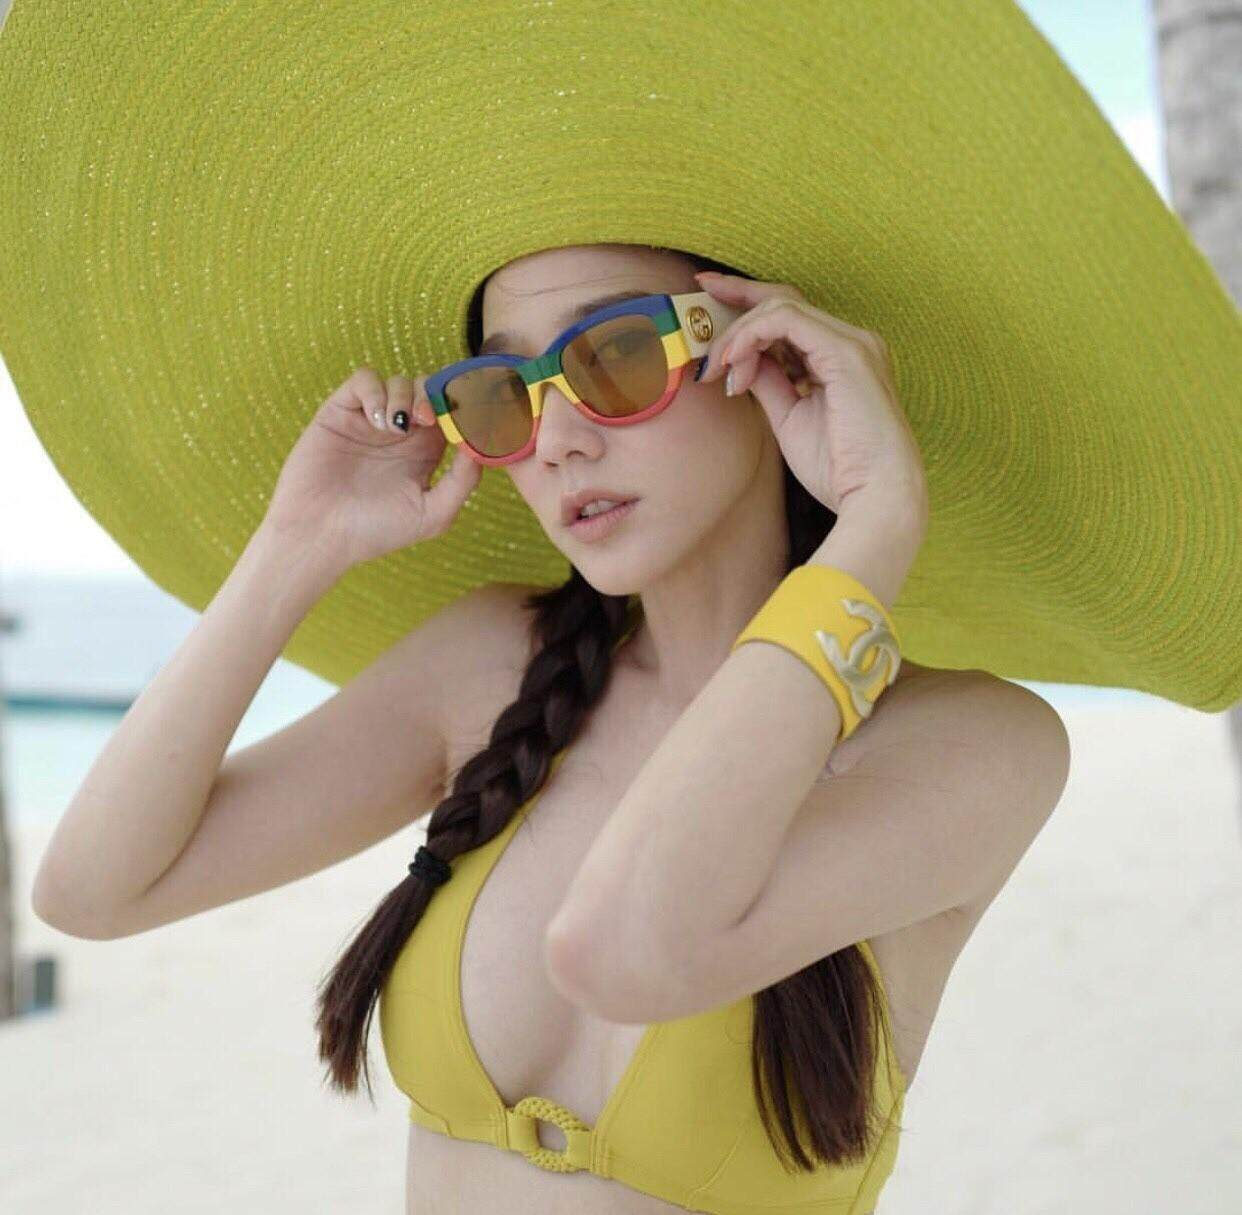 dbfbf538750b4 หมวกป่านศรนารายณ์ หมวกปีก หมวกสาน หมวกปีกว้าง oversize hats beach hats Hot  sale wide Brim sun hats for women Letter Embroidery straw Hats girls Do Not  ...